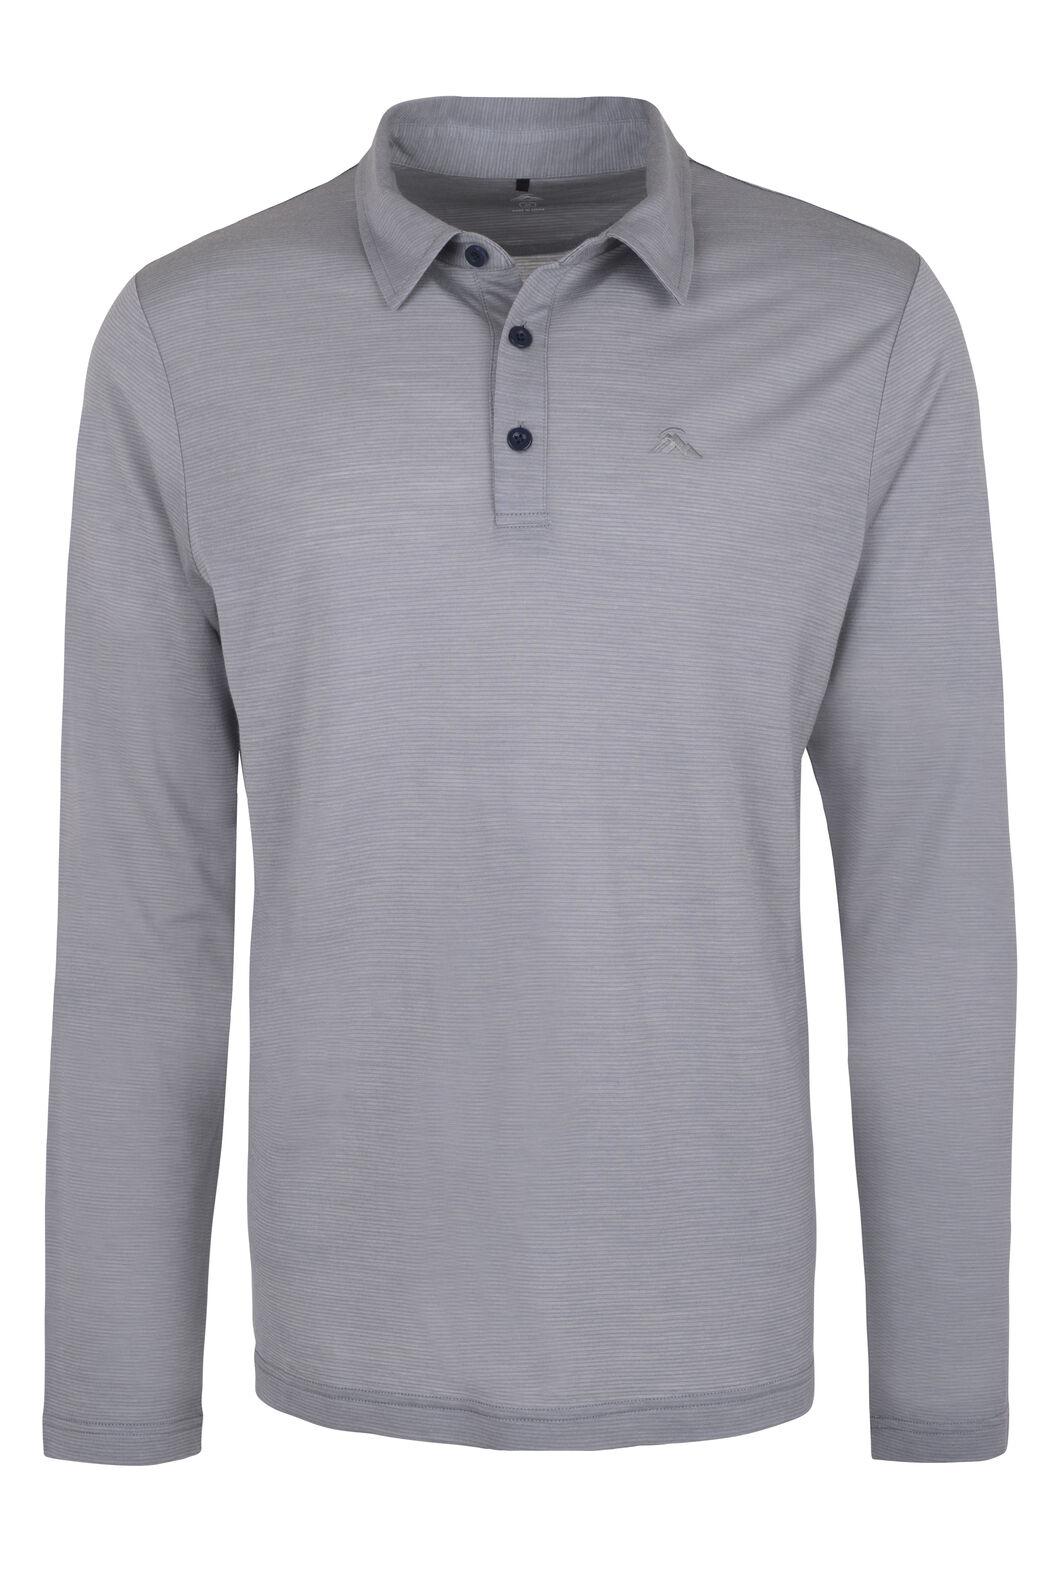 Macpac Merino Blend Long Sleeve Polo — Men's, Mid Grey, hi-res